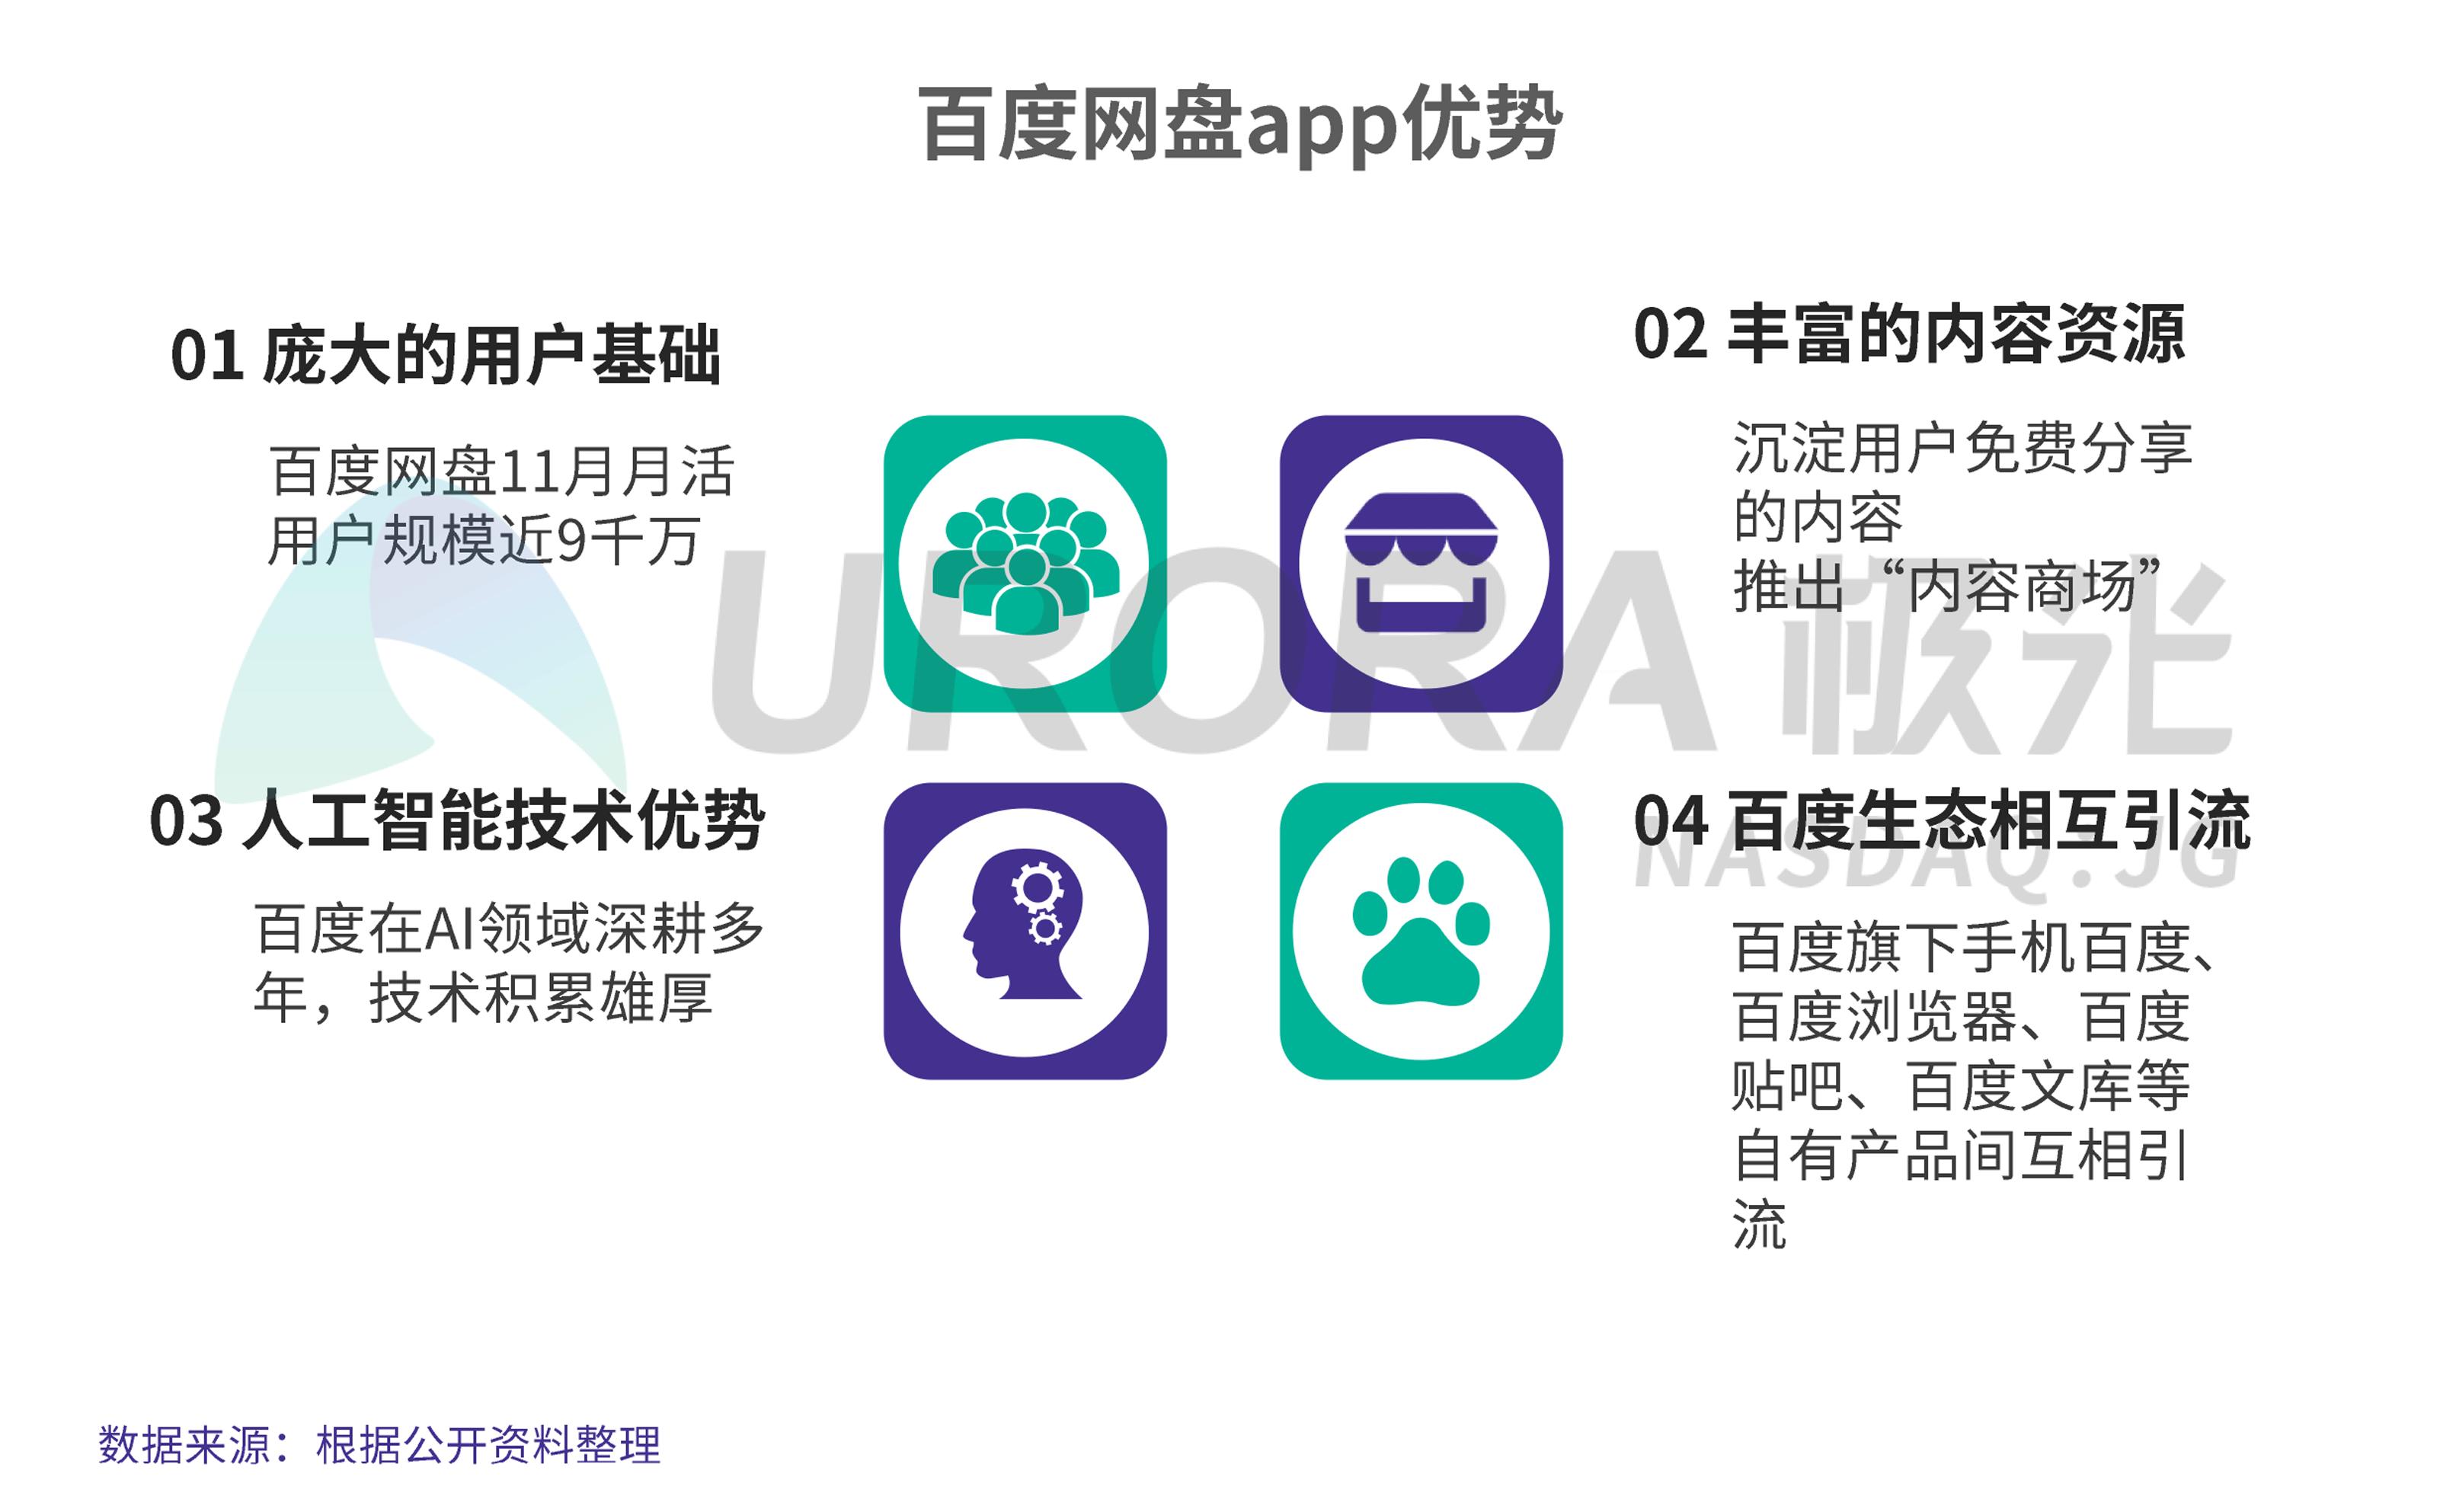 JIGUANG-个人网盘行业研究报告-final---切图版2-26.png